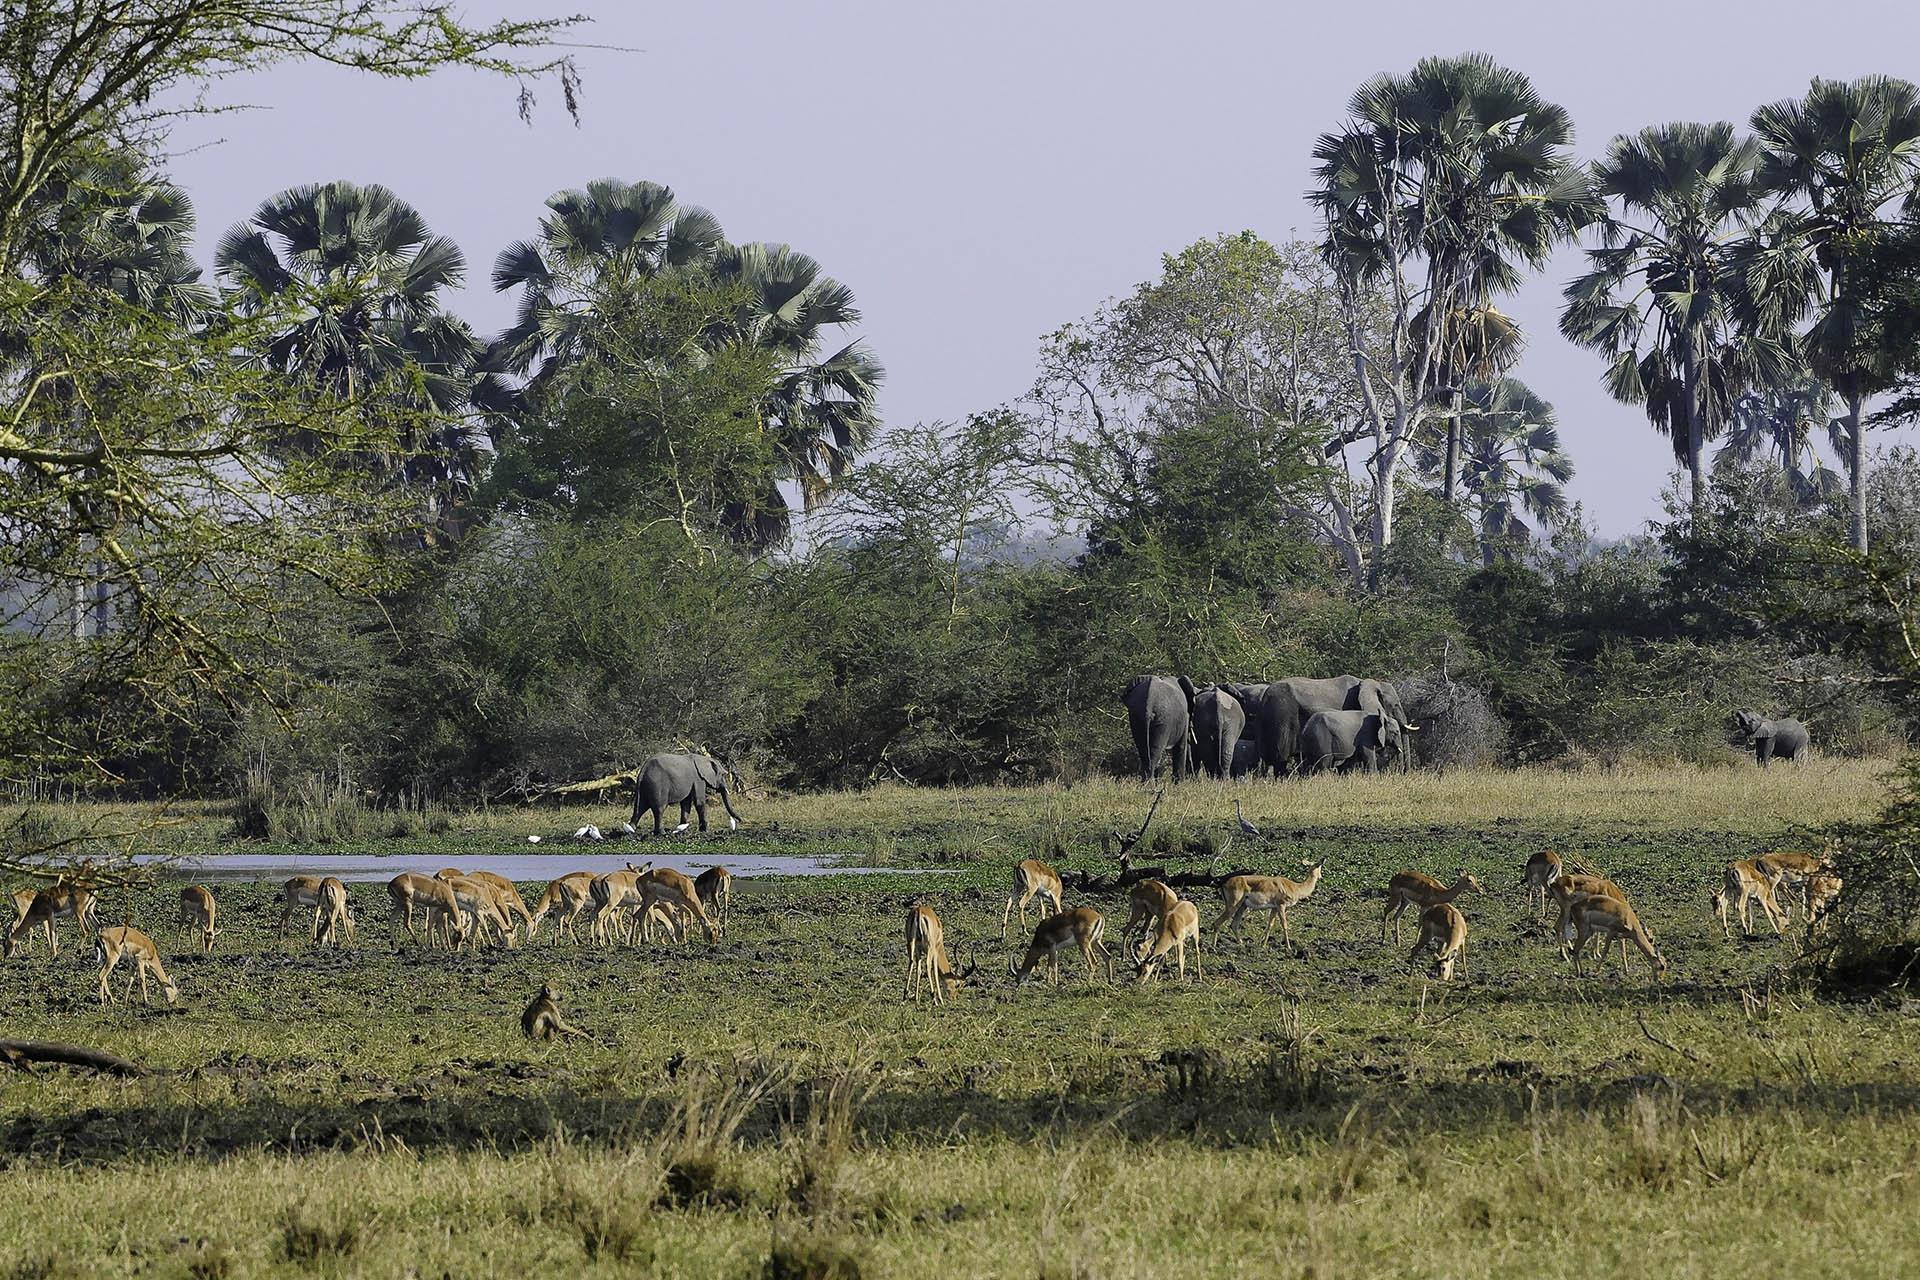 family holidays malawi-zambia-family-holiday-15-nights-zambia-national-parks-malawian-style-malawi-adventures-experiences-specialist-tour-operator-mvuu